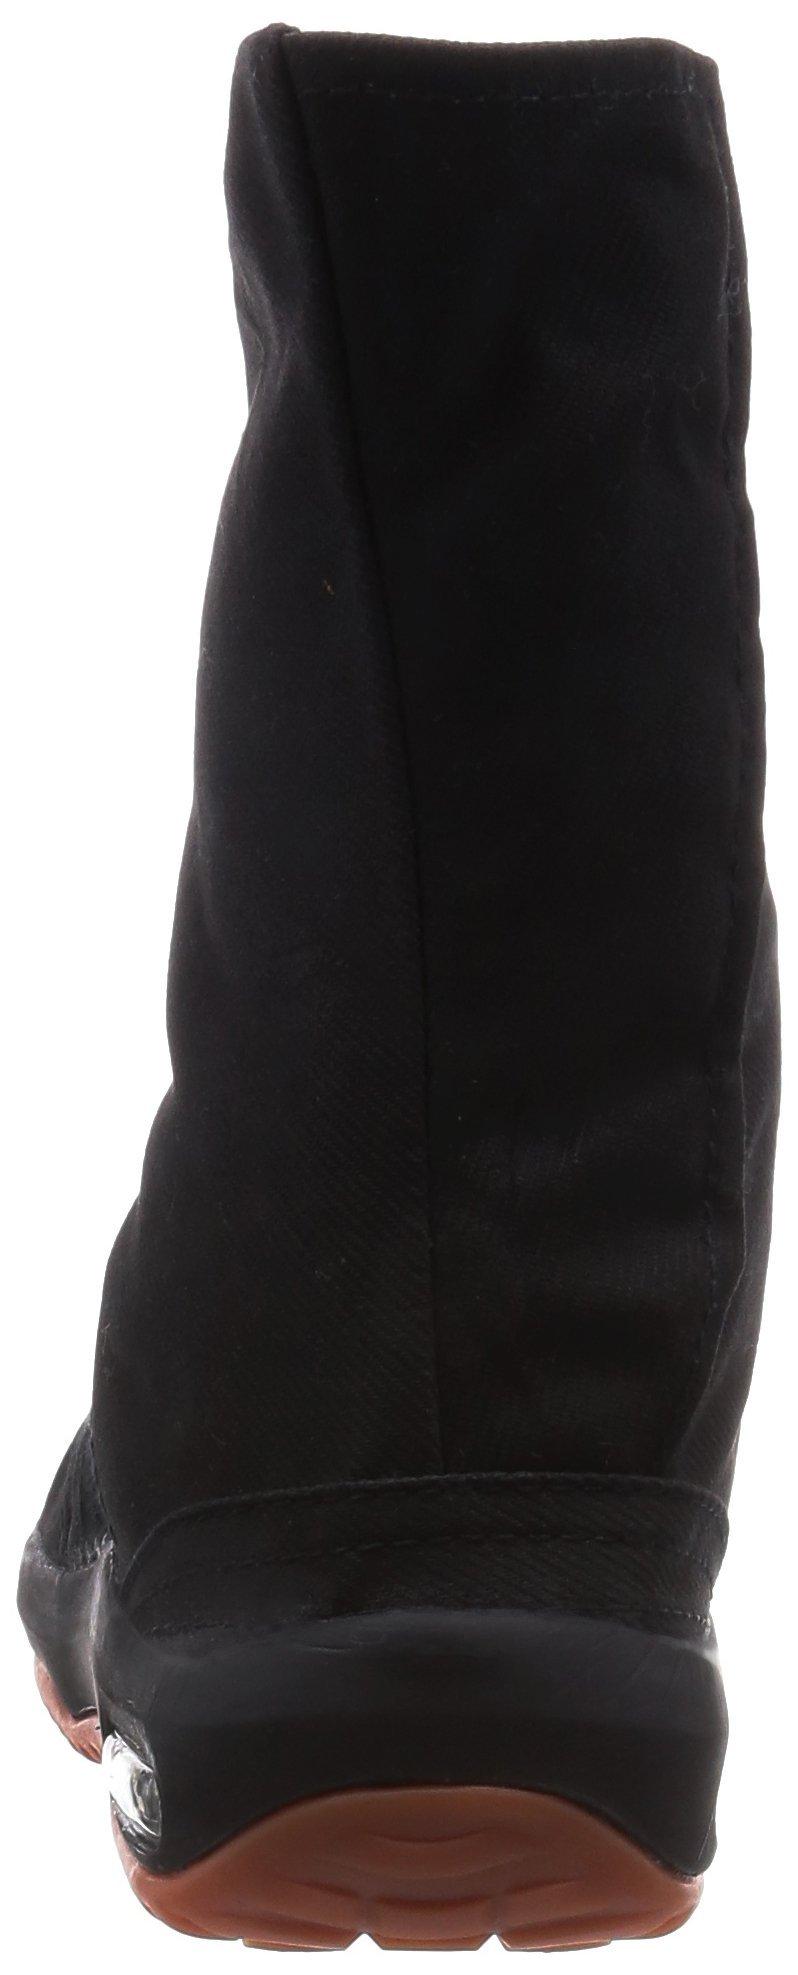 Ninja shoes, AIR JOG 6, Jika TabiSize: 25.0 cm (US size 7 ), Color: Black by Marugo (Image #3)